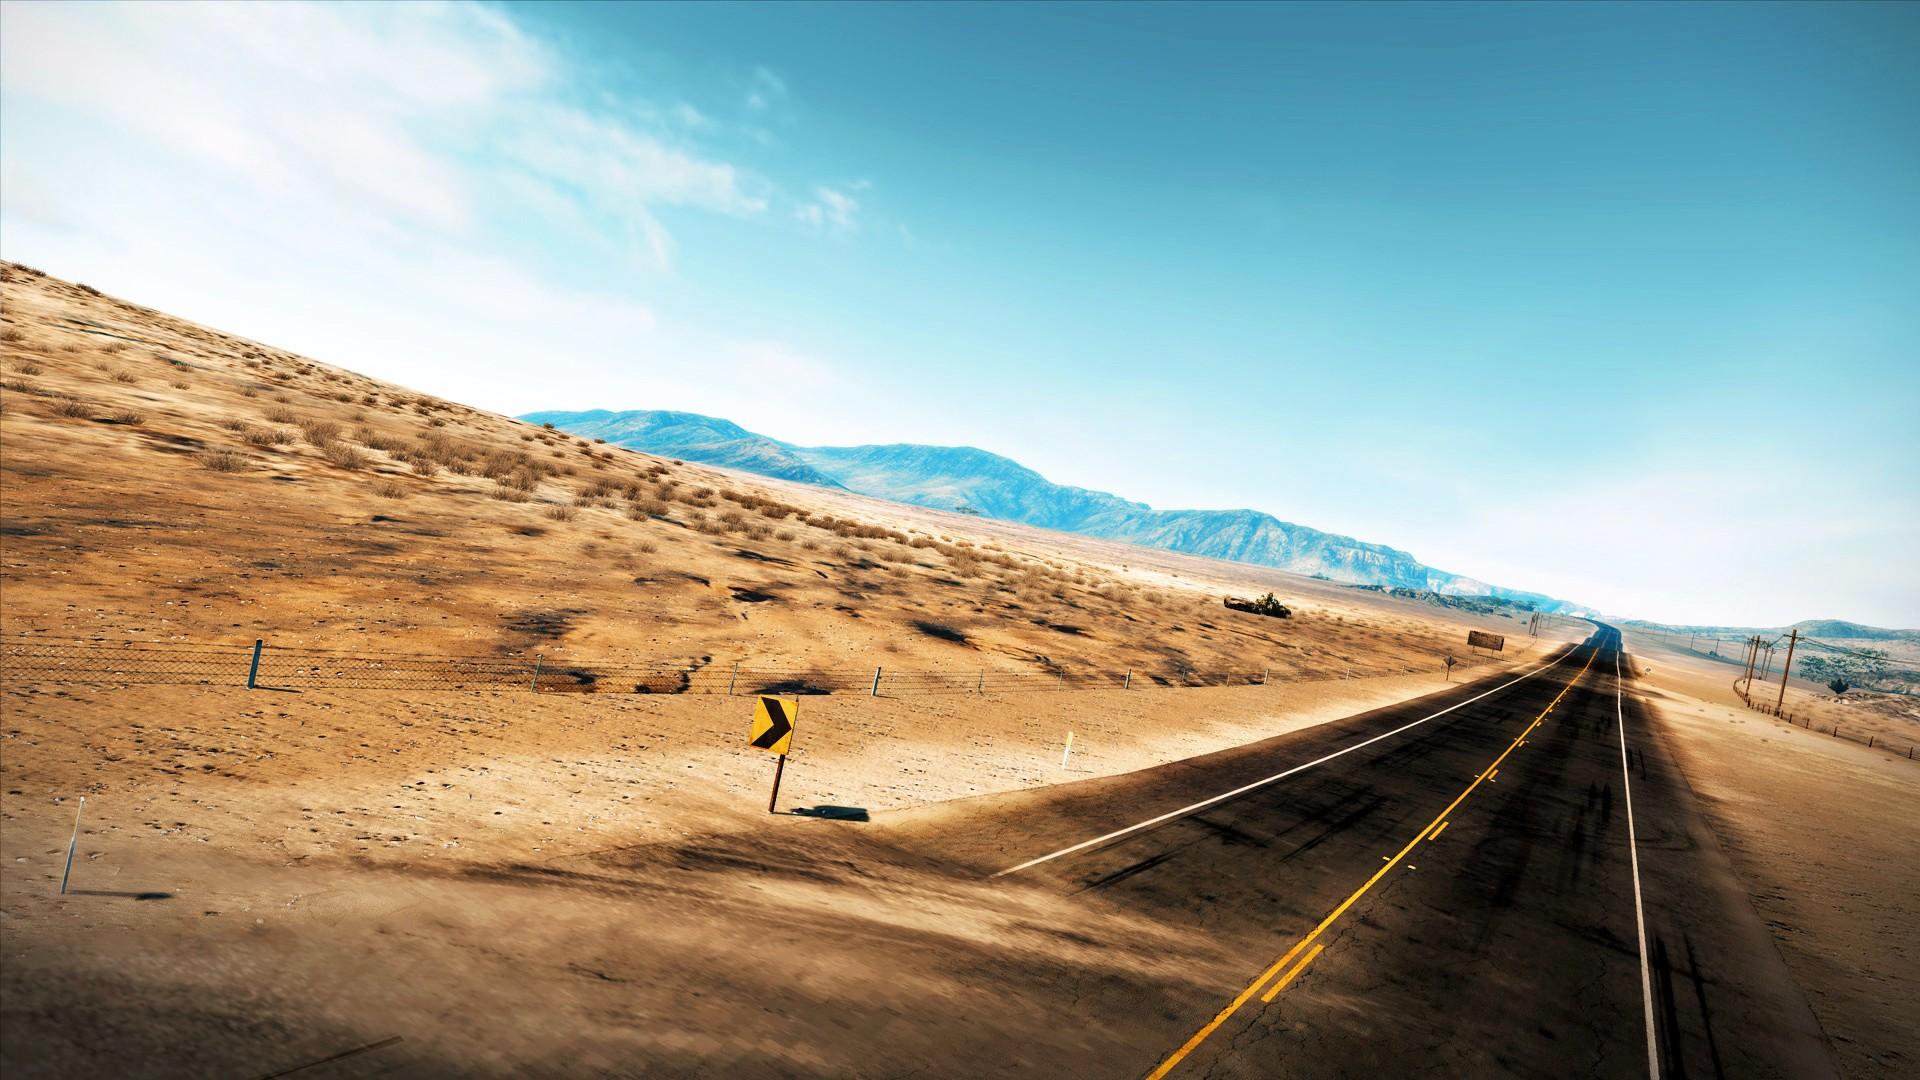 Desert Wallpaper ① Download Free Cool Full Hd Backgrounds For